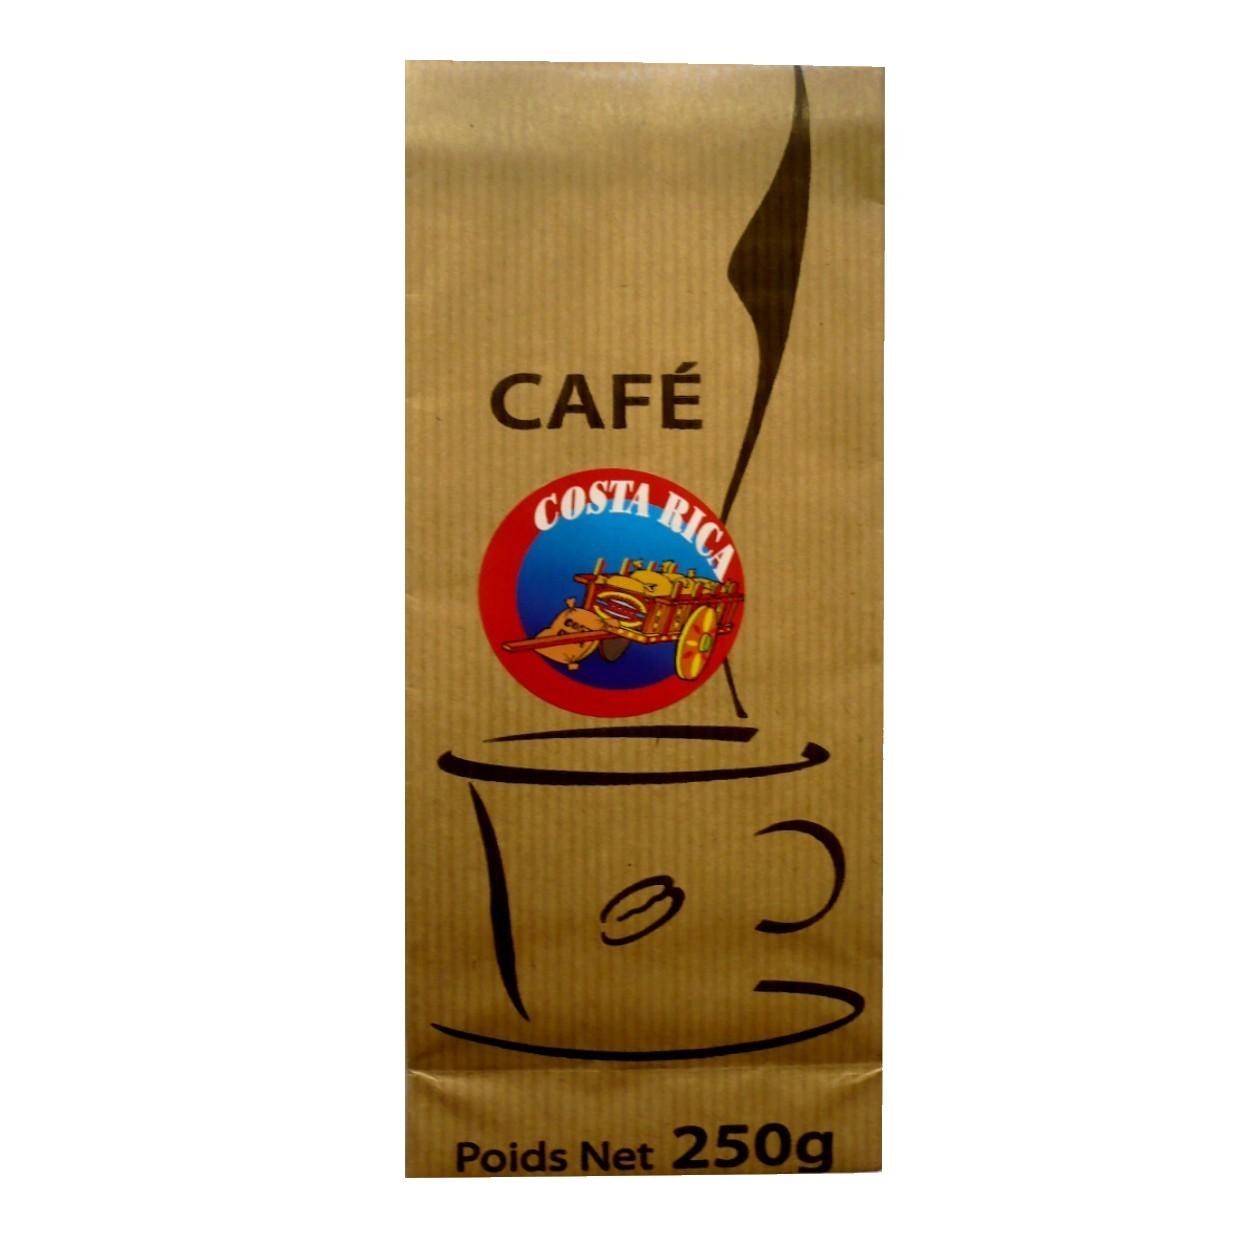 Caf du costa rica 250 g complet fin parfum torr fi - Comptoir gourmand toulouse ...